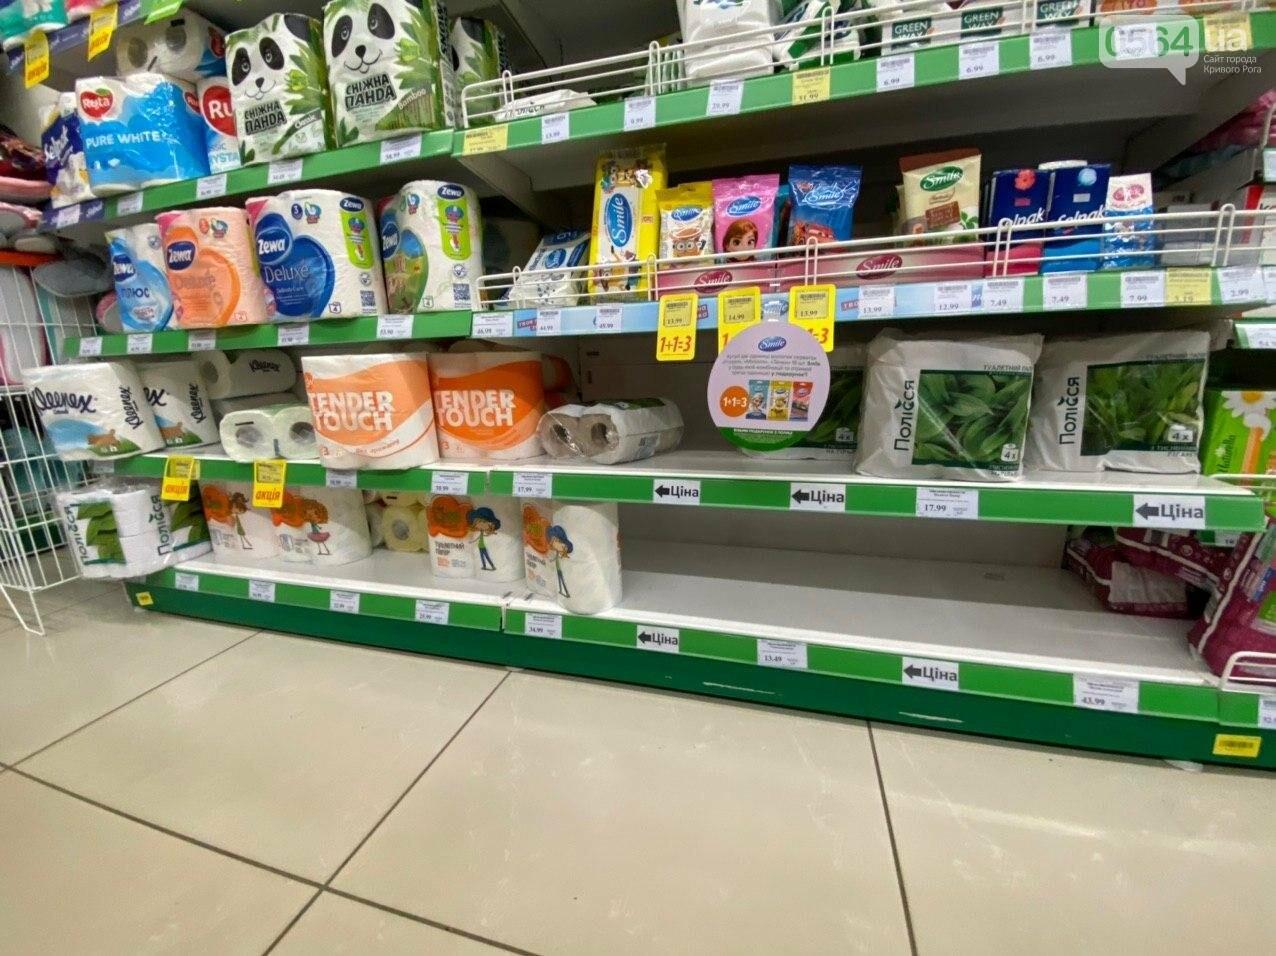 Туалетная бумага и гречка: что скупают криворожане во время карантина, - ФОТО , фото-20